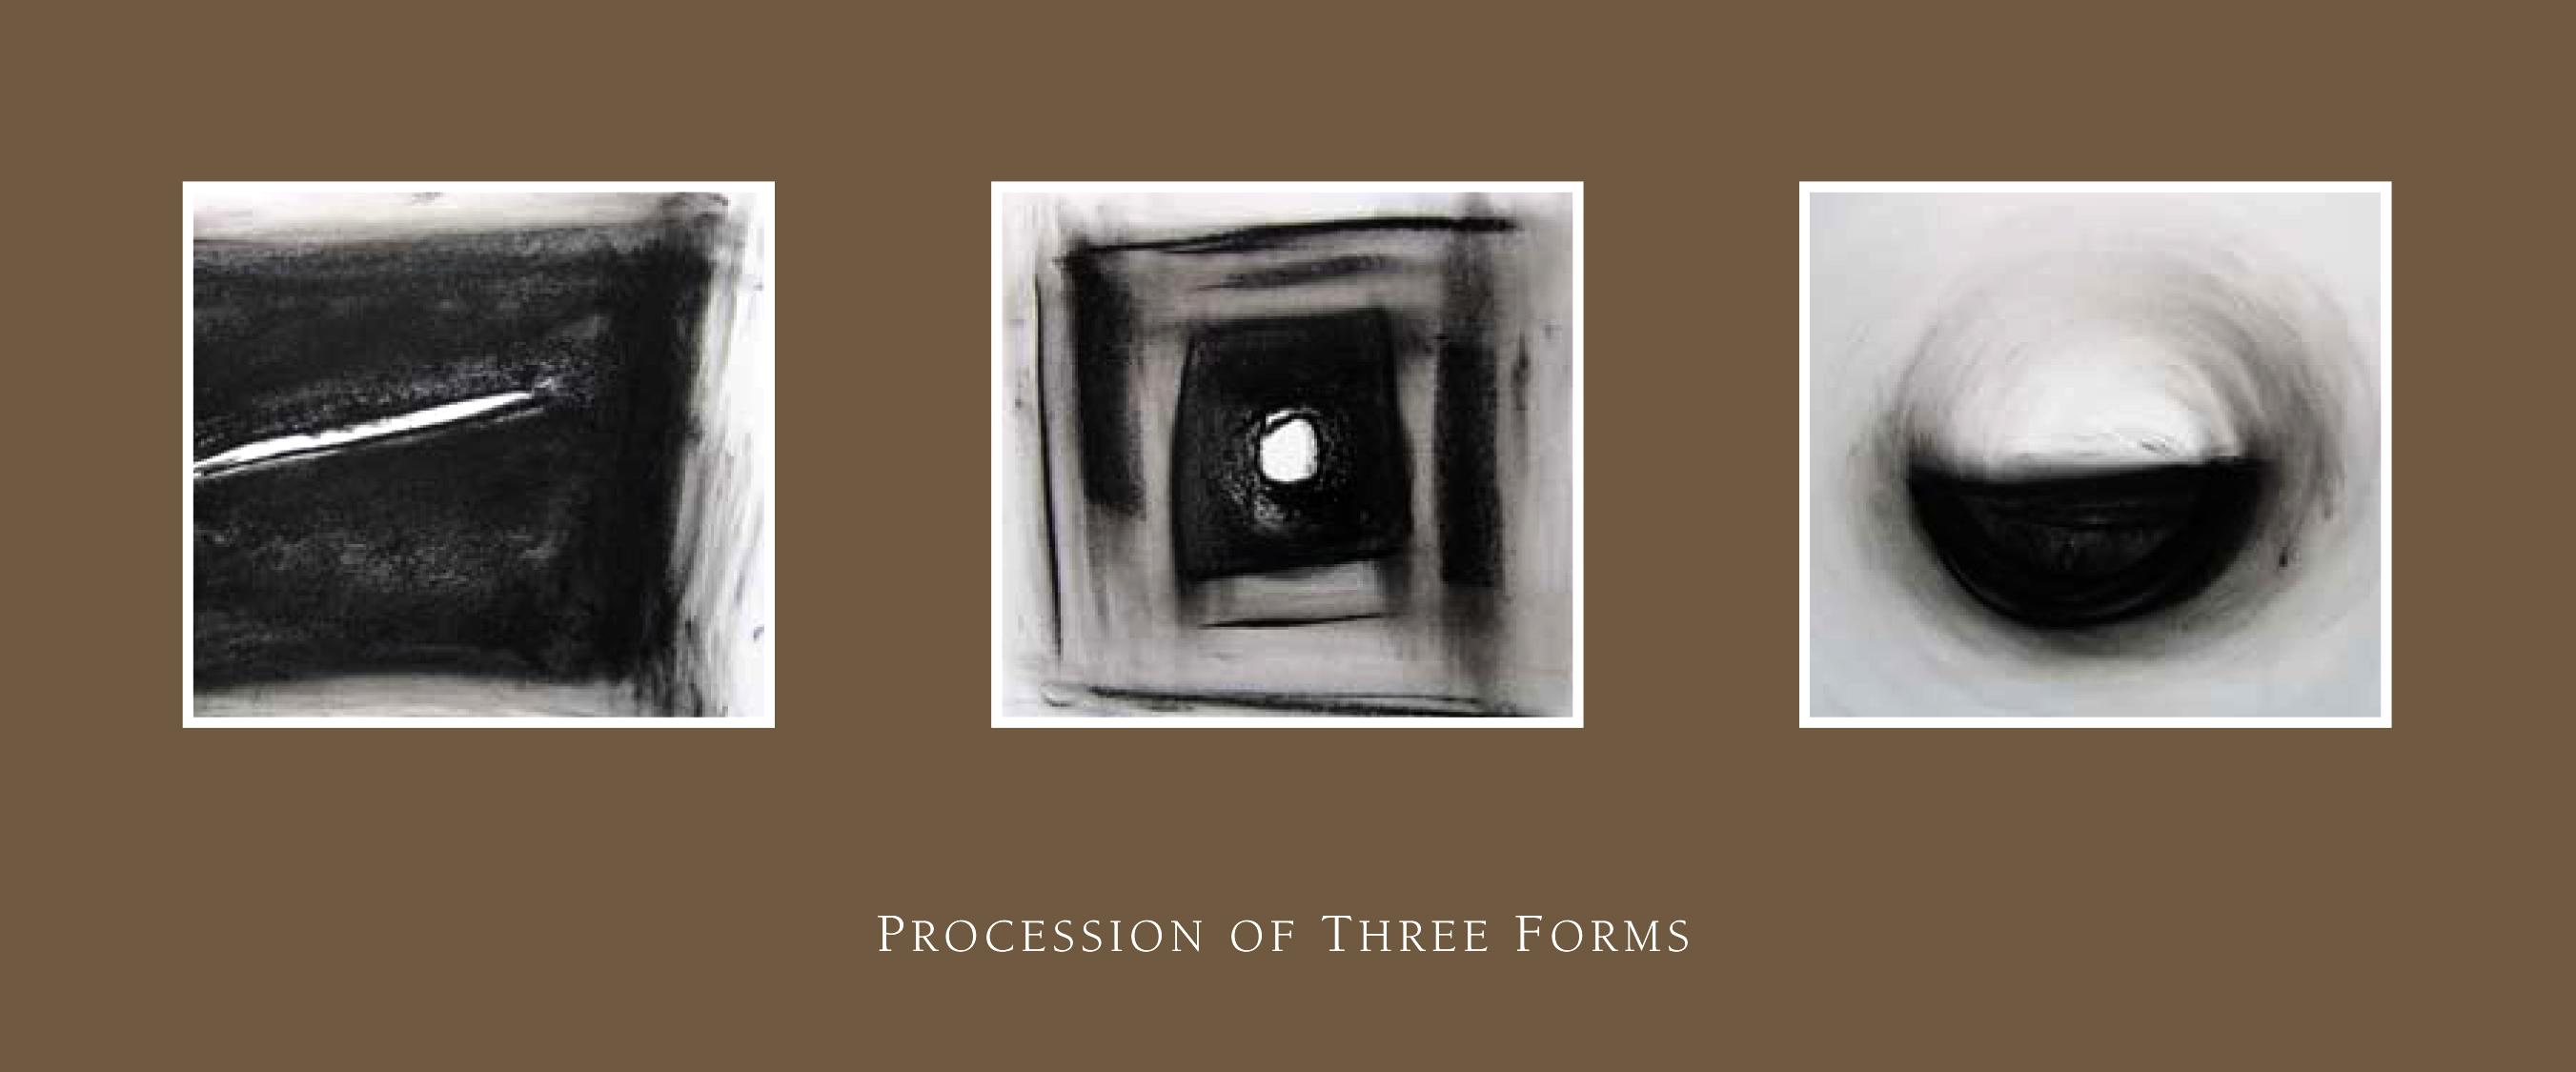 ProcessionOfThreeForms102112